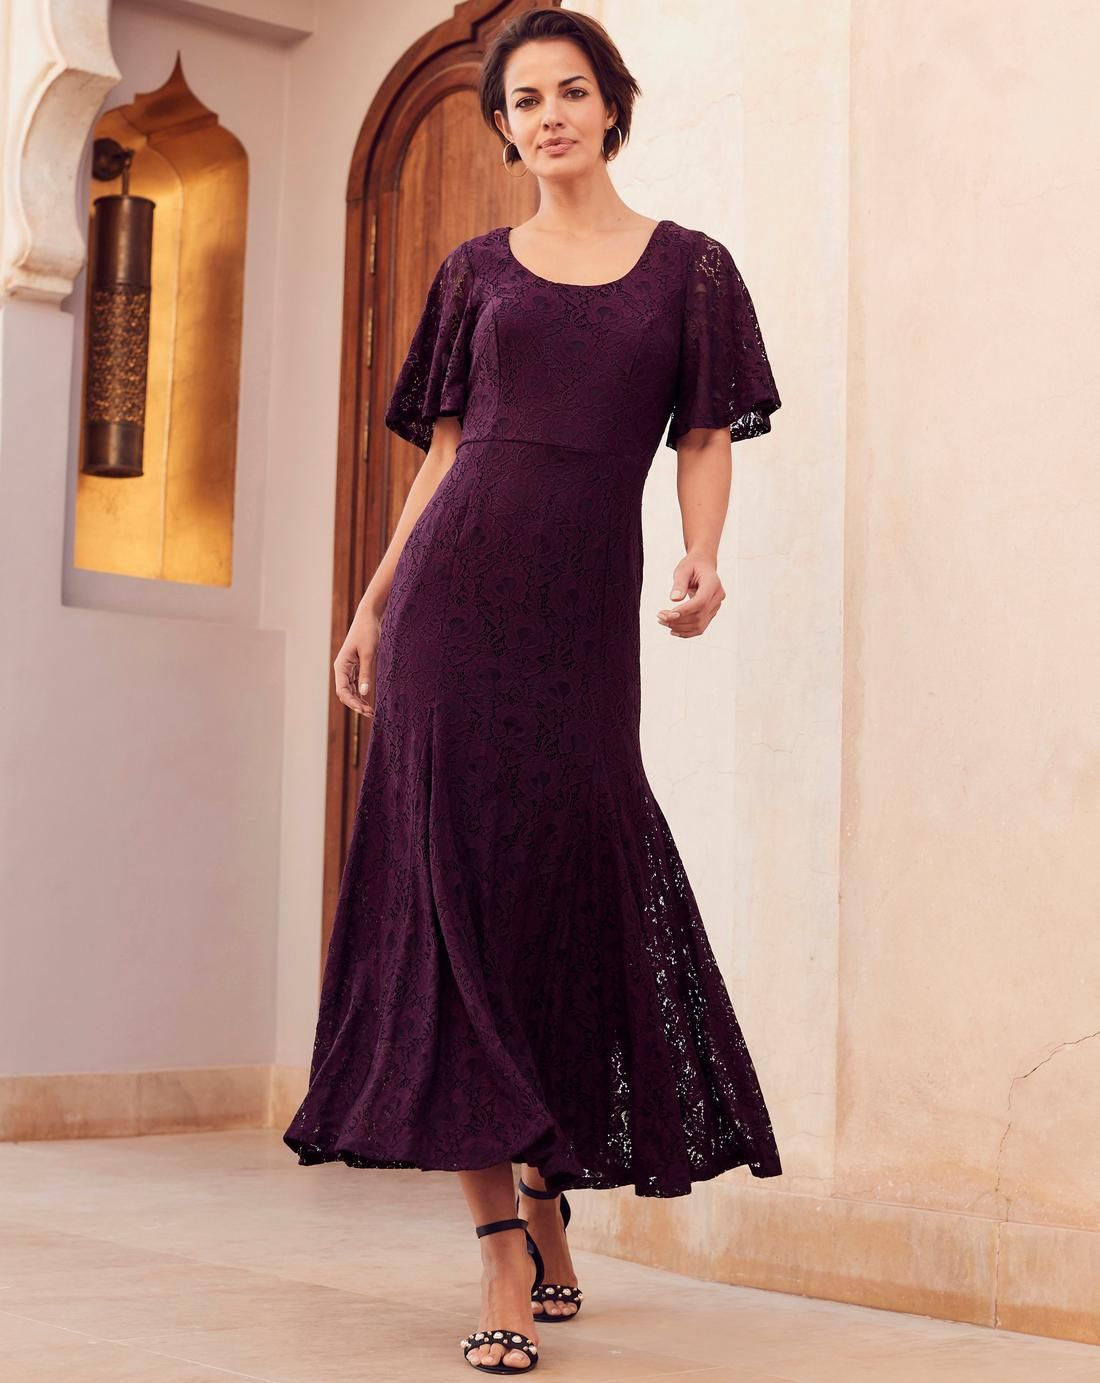 Joanna Hope Lace Maxi Dress Lace Maxi Dress Dresses 1920s Fashion Dresses [ 1383 x 1100 Pixel ]